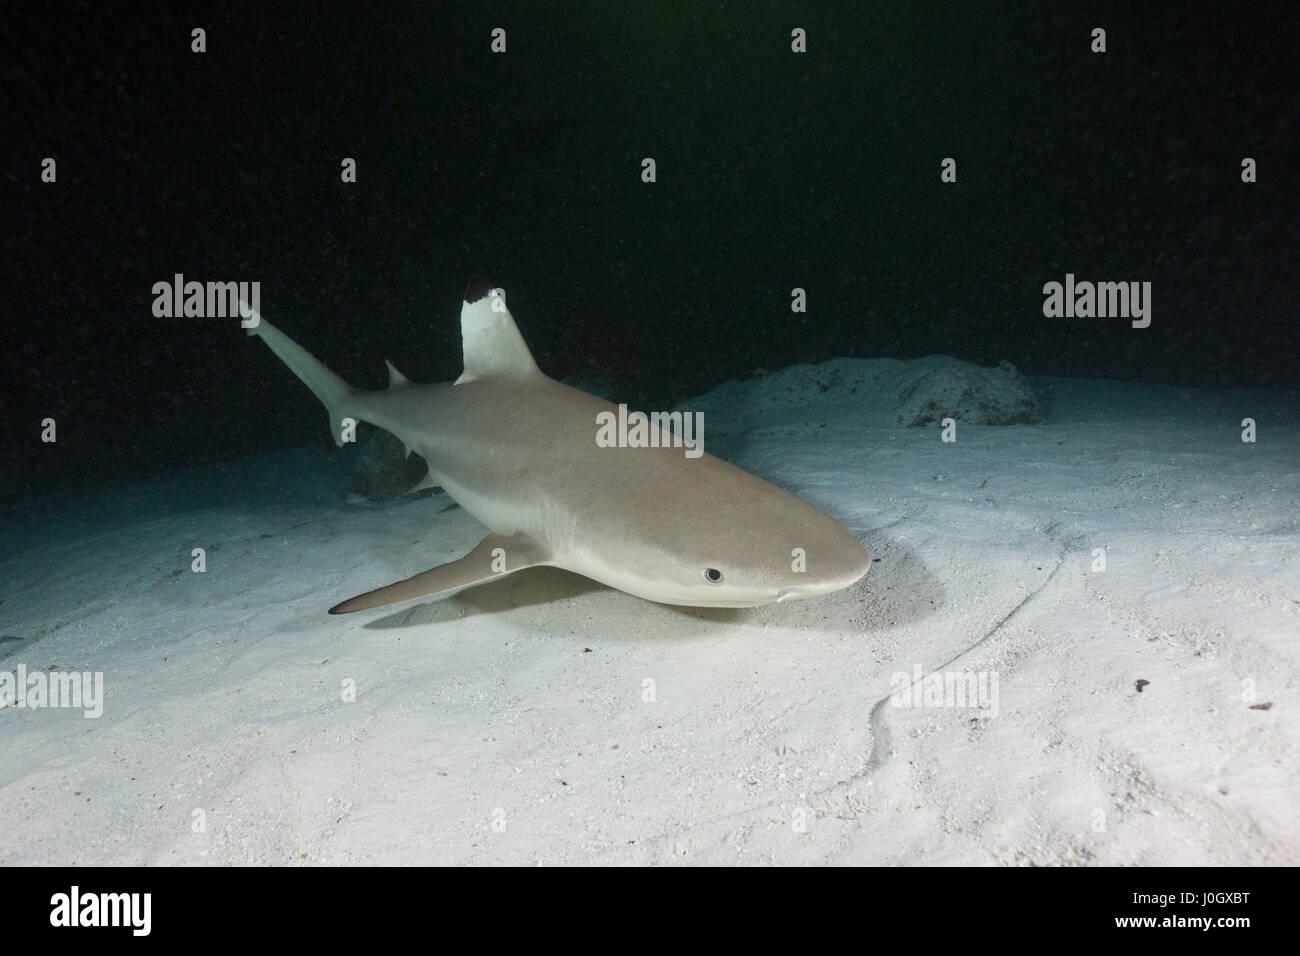 Blacktip Reef Shark, Carcharhinus melanopterus, Felidhu Atoll, Maldives Stock Photo